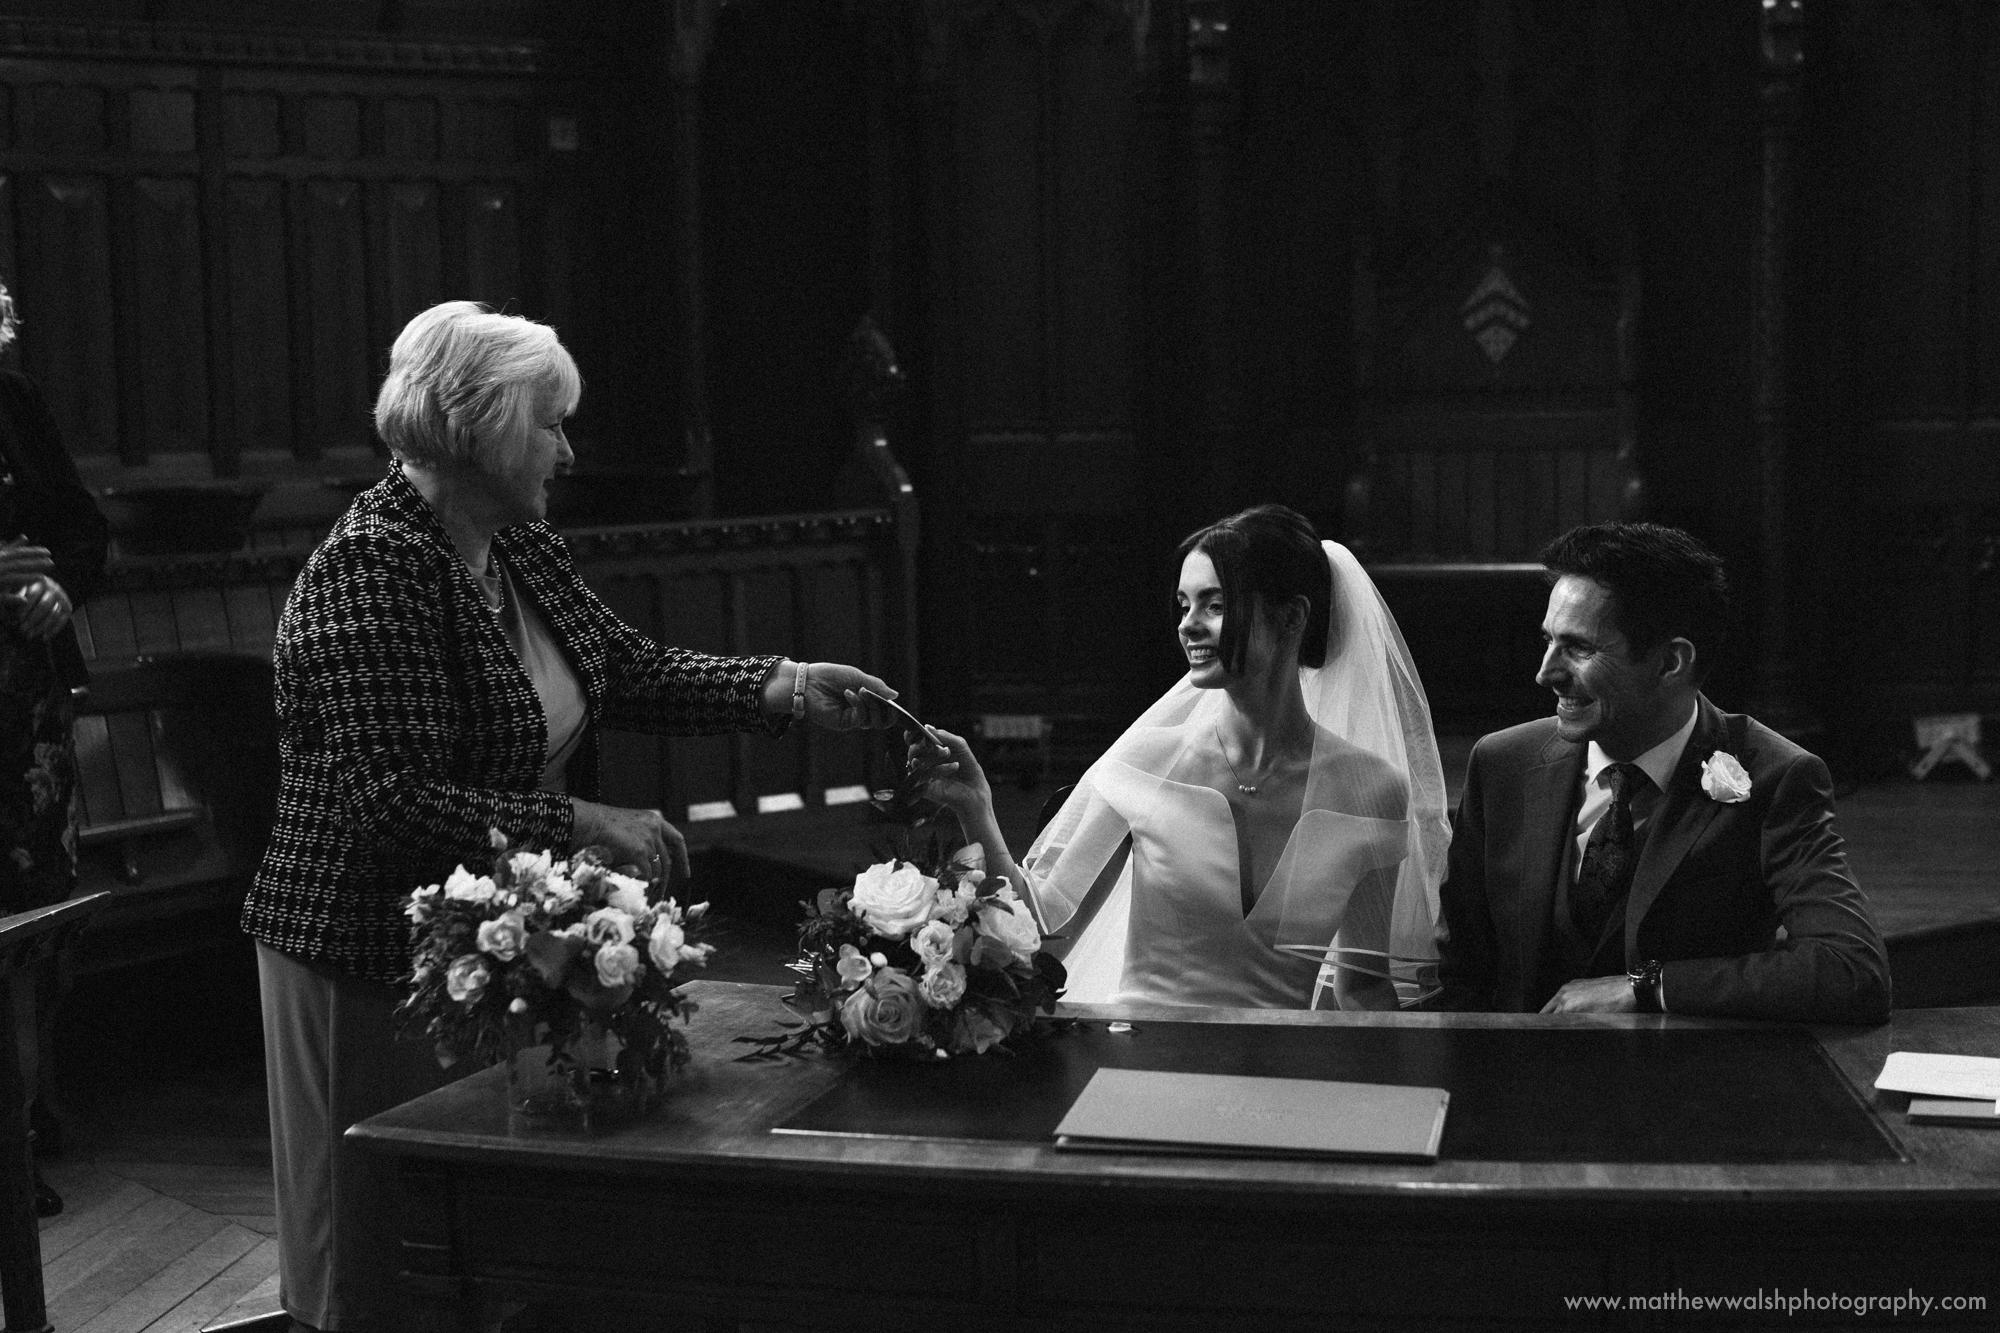 Handing over the marriage certificate